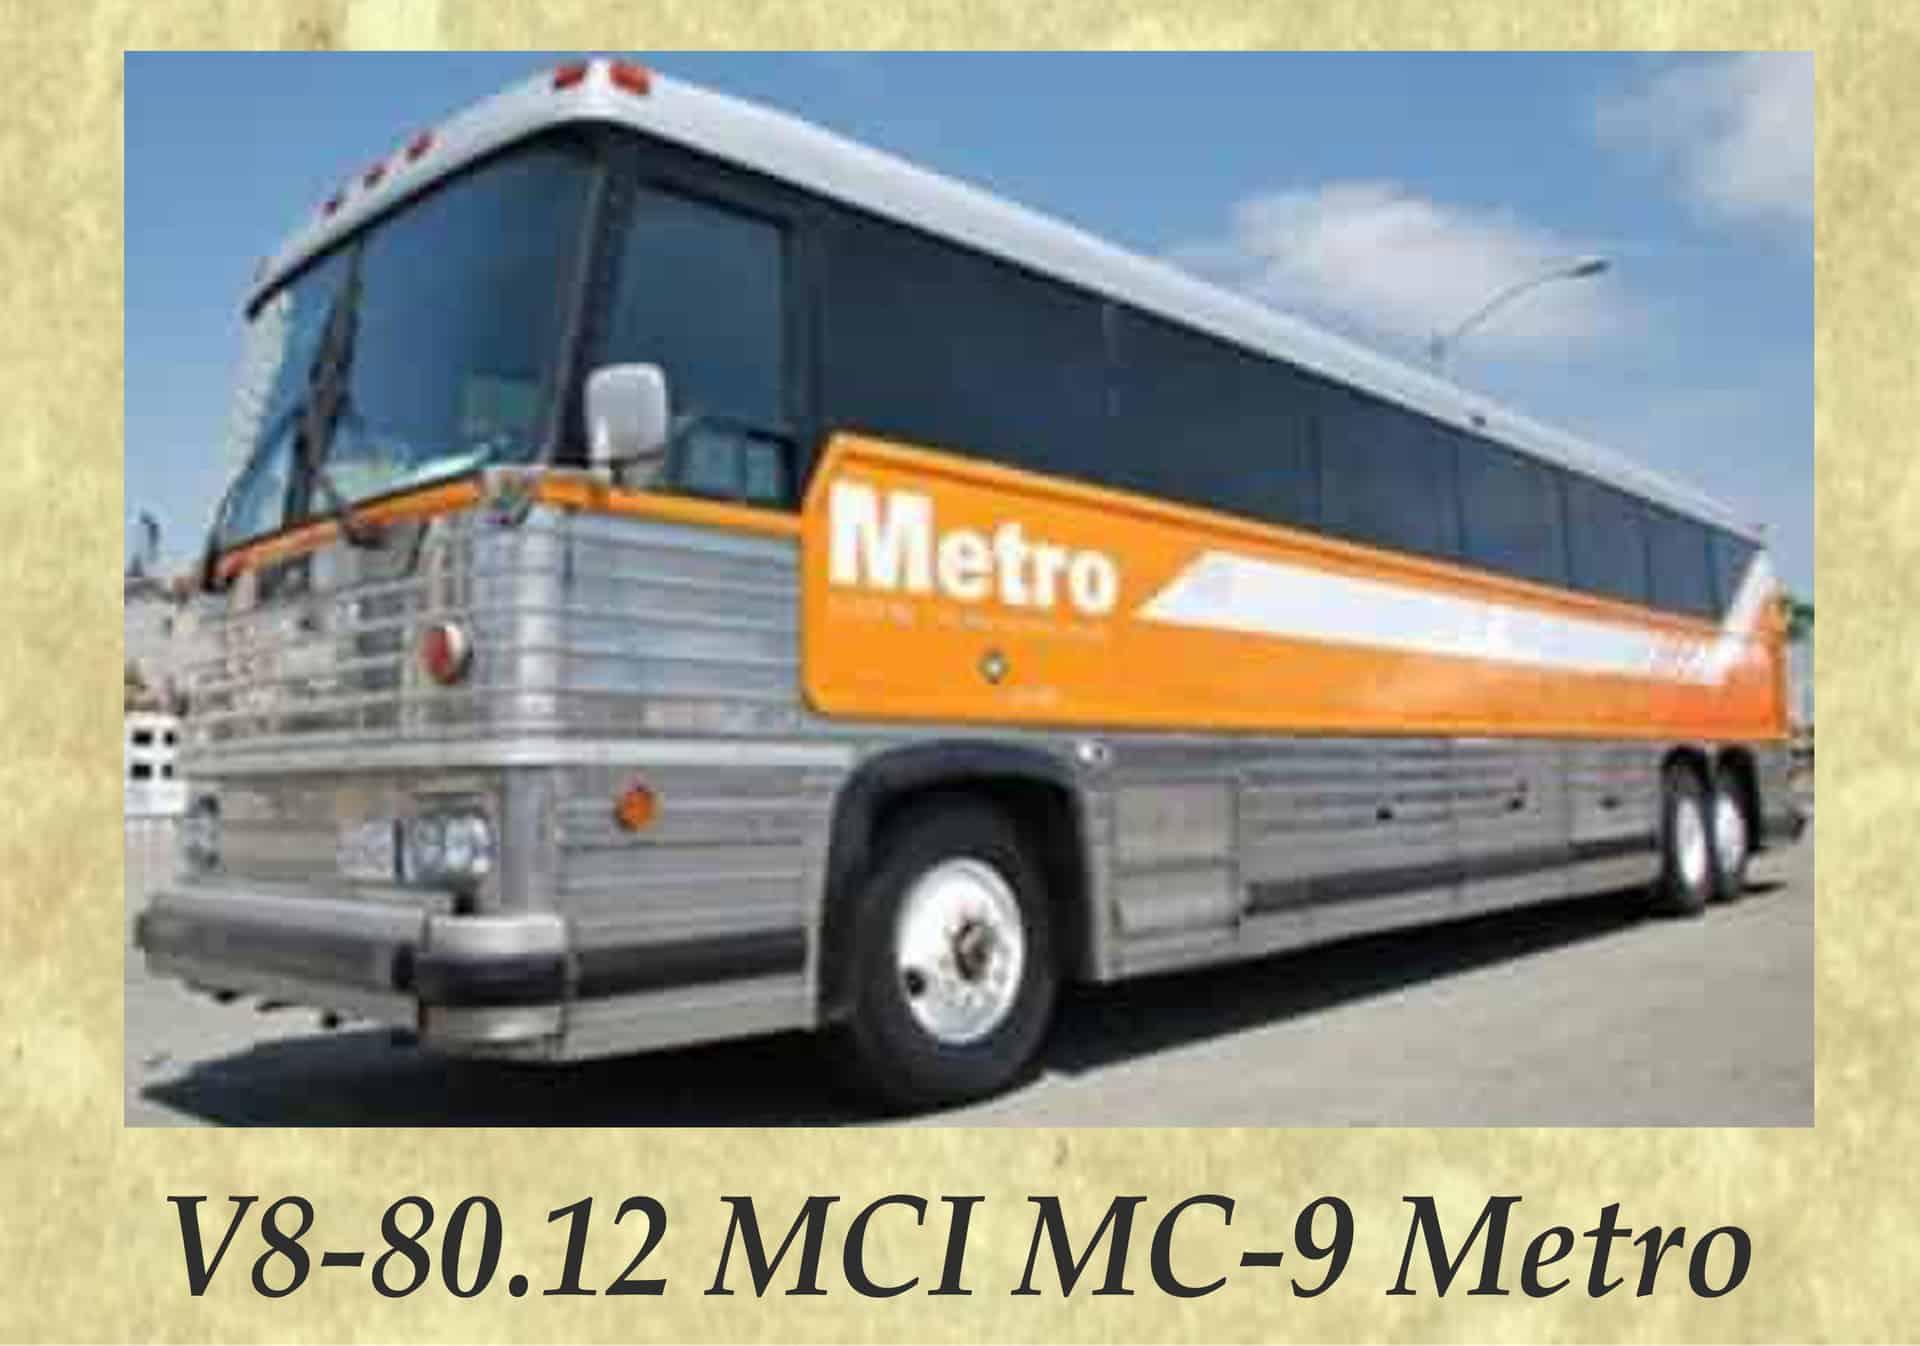 V8-80.12 MCI MC-9 Metro